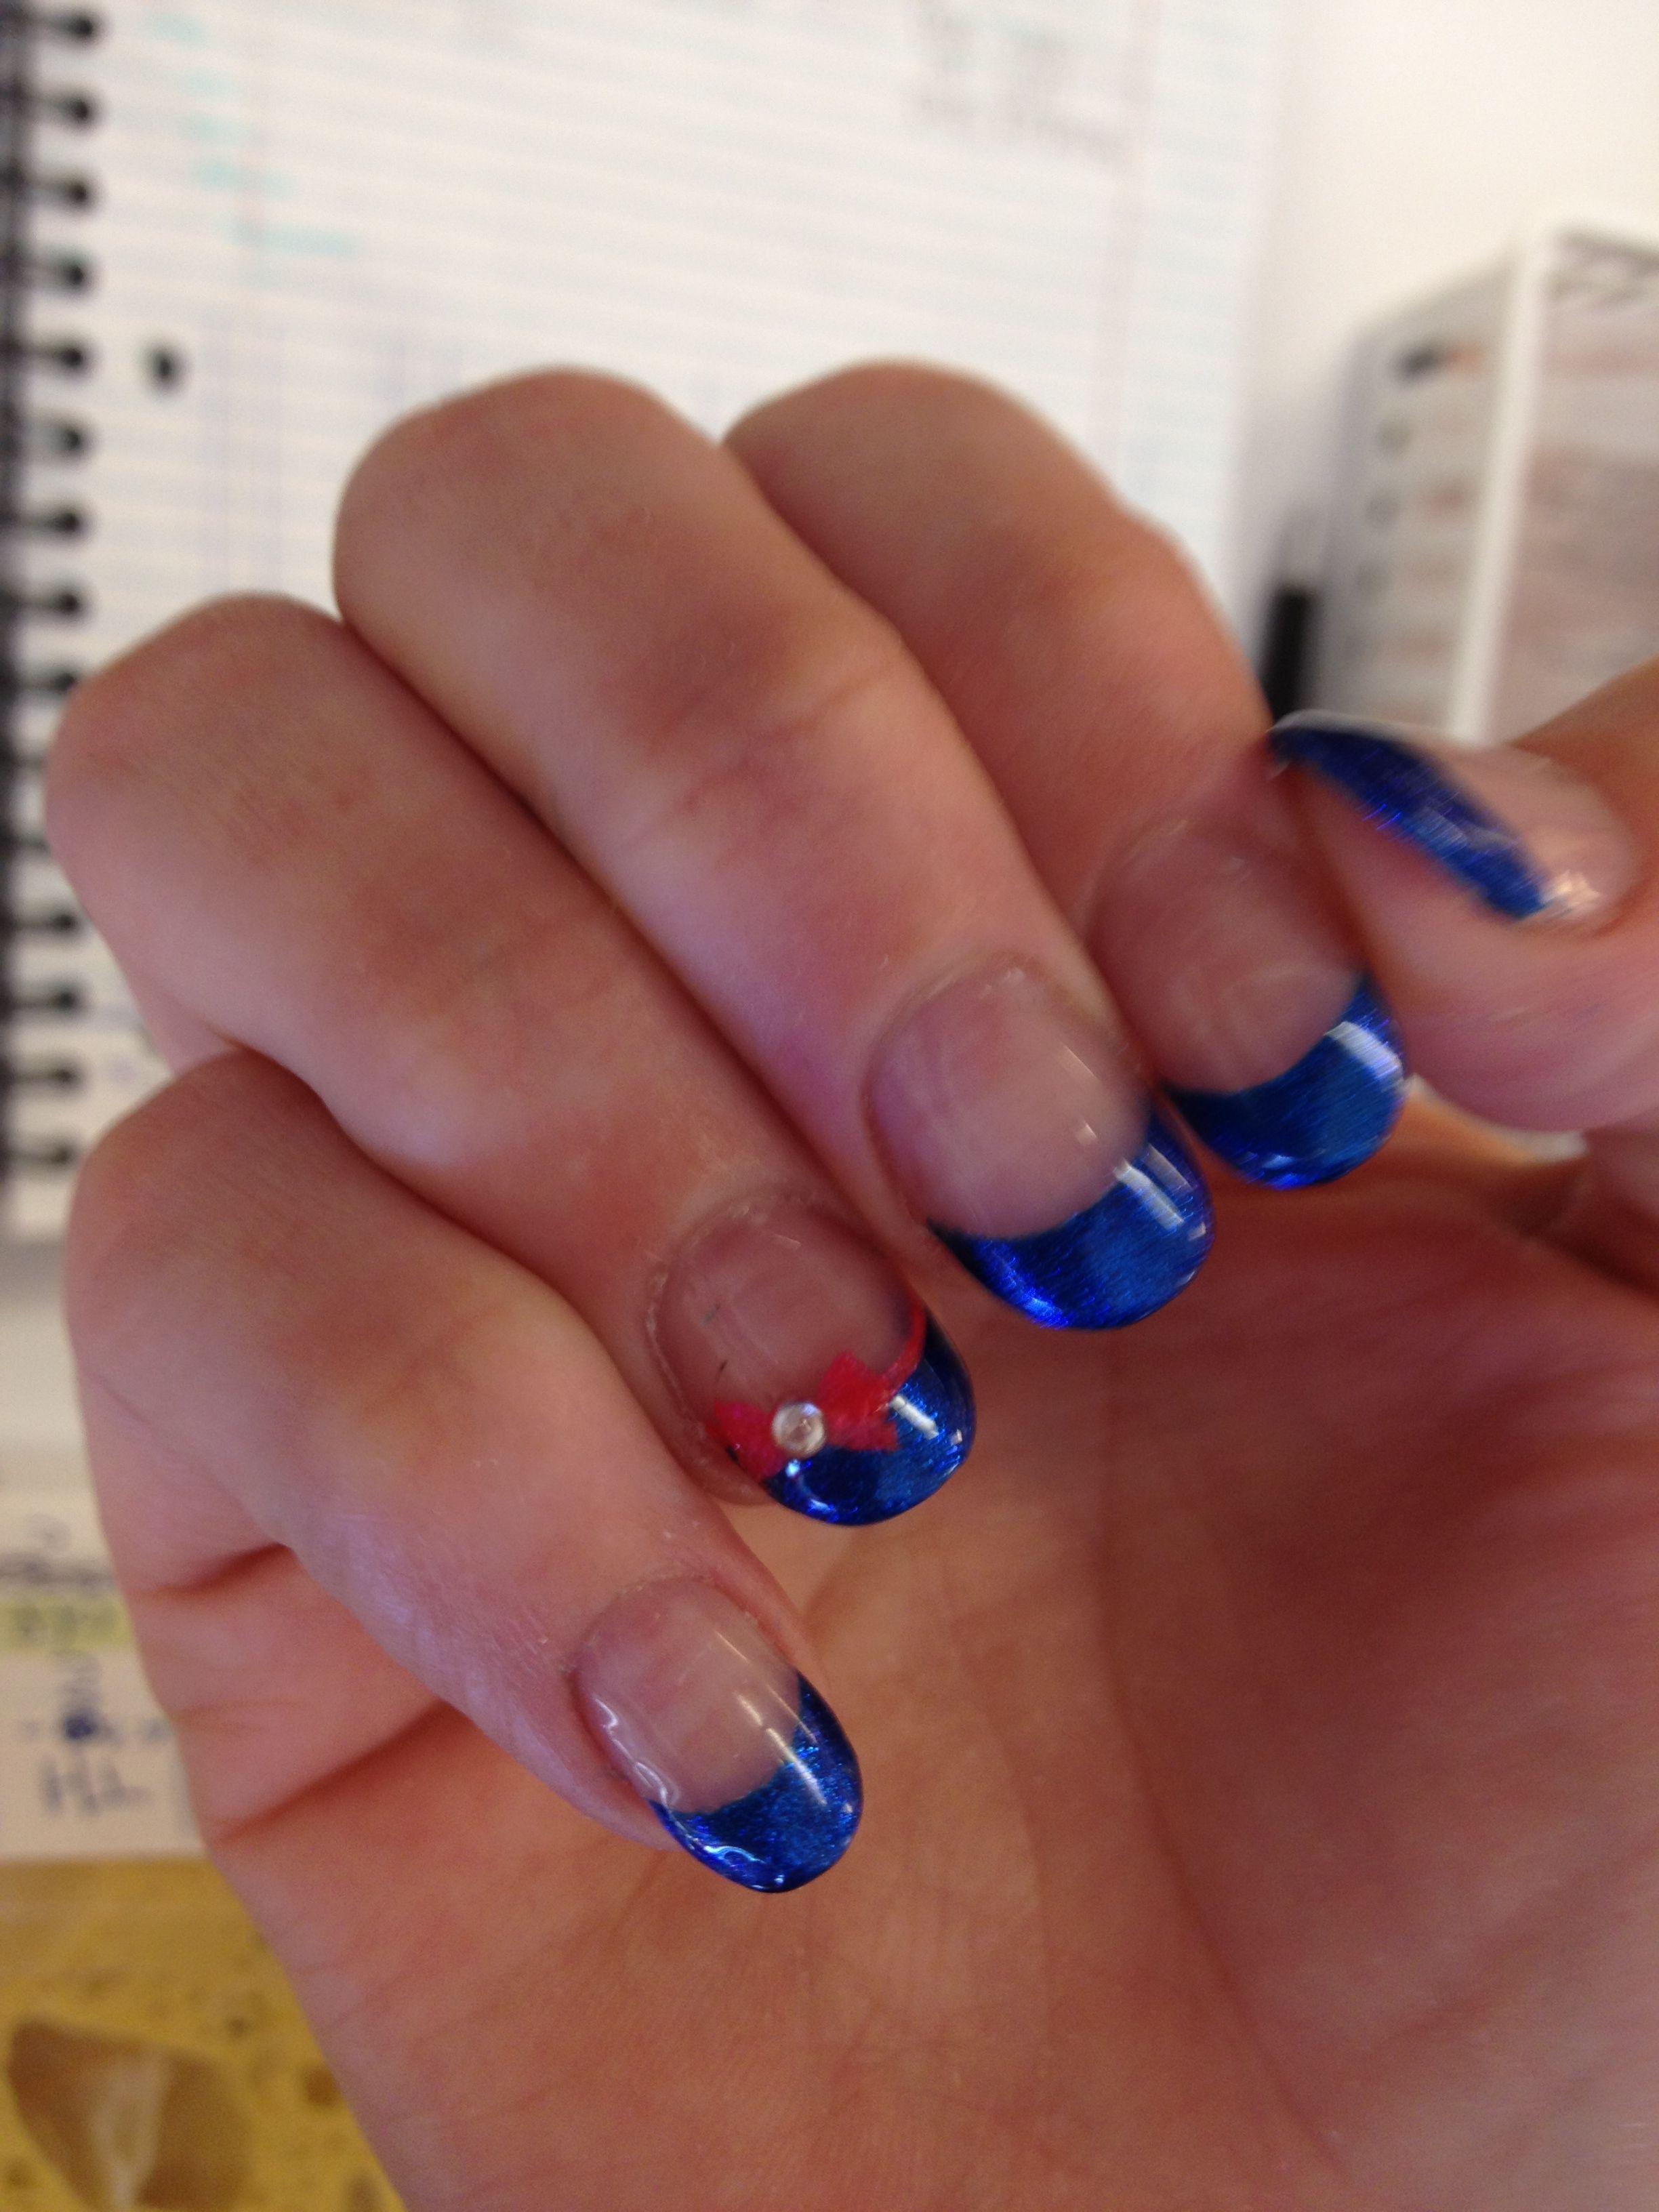 Bows Nails art @ Ocean Nails and Spa. FWB, FL.